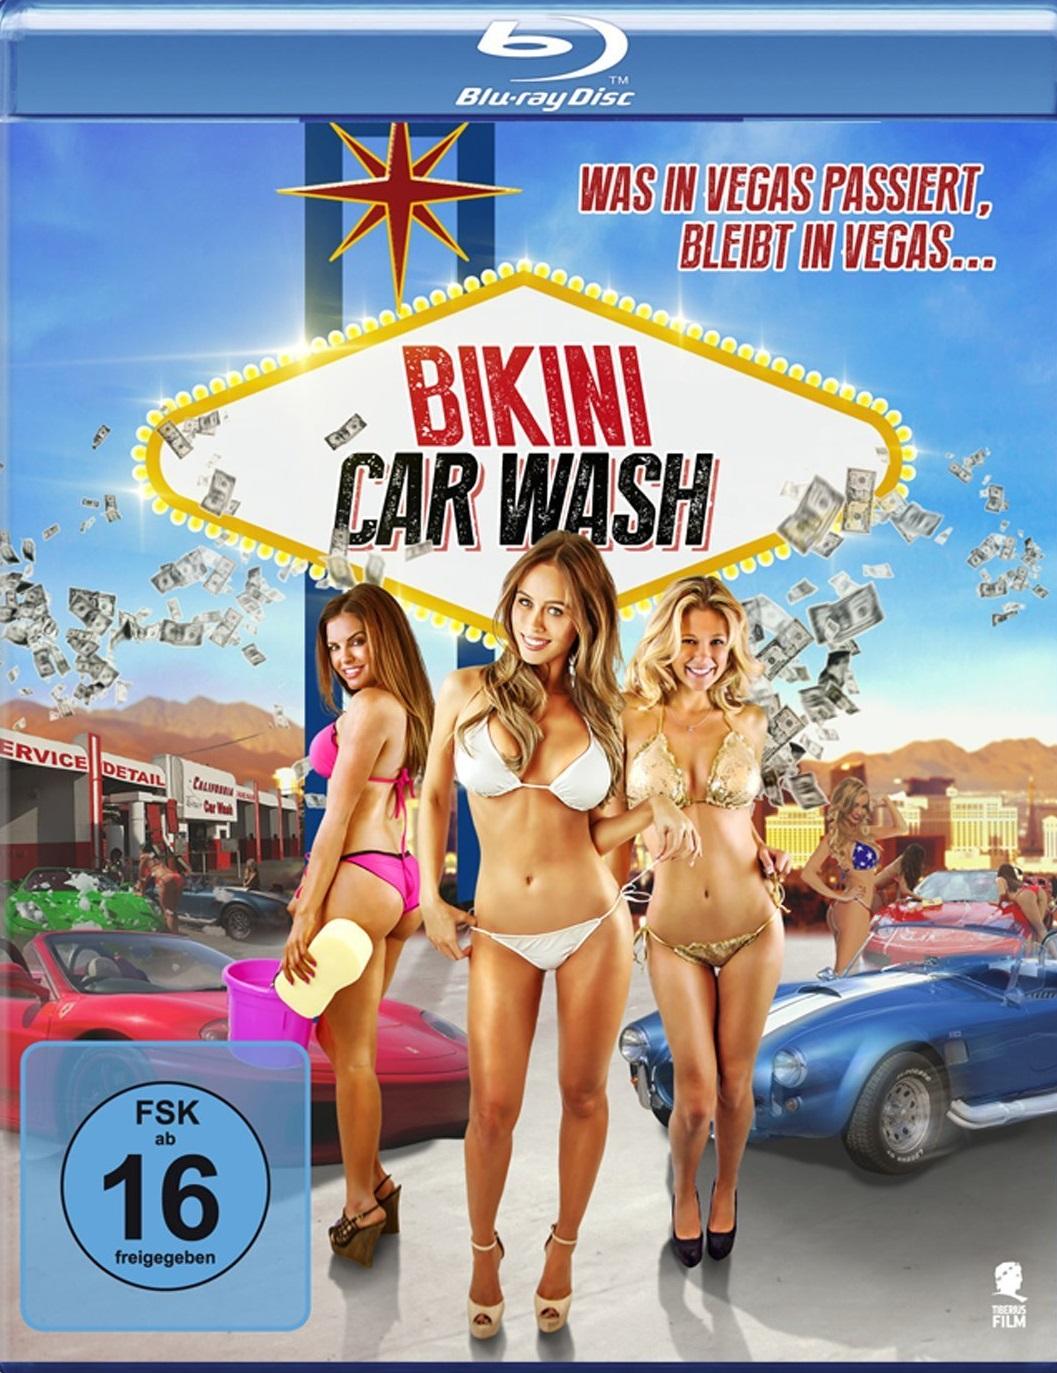 The Bikini Carwash Company 1992 Full